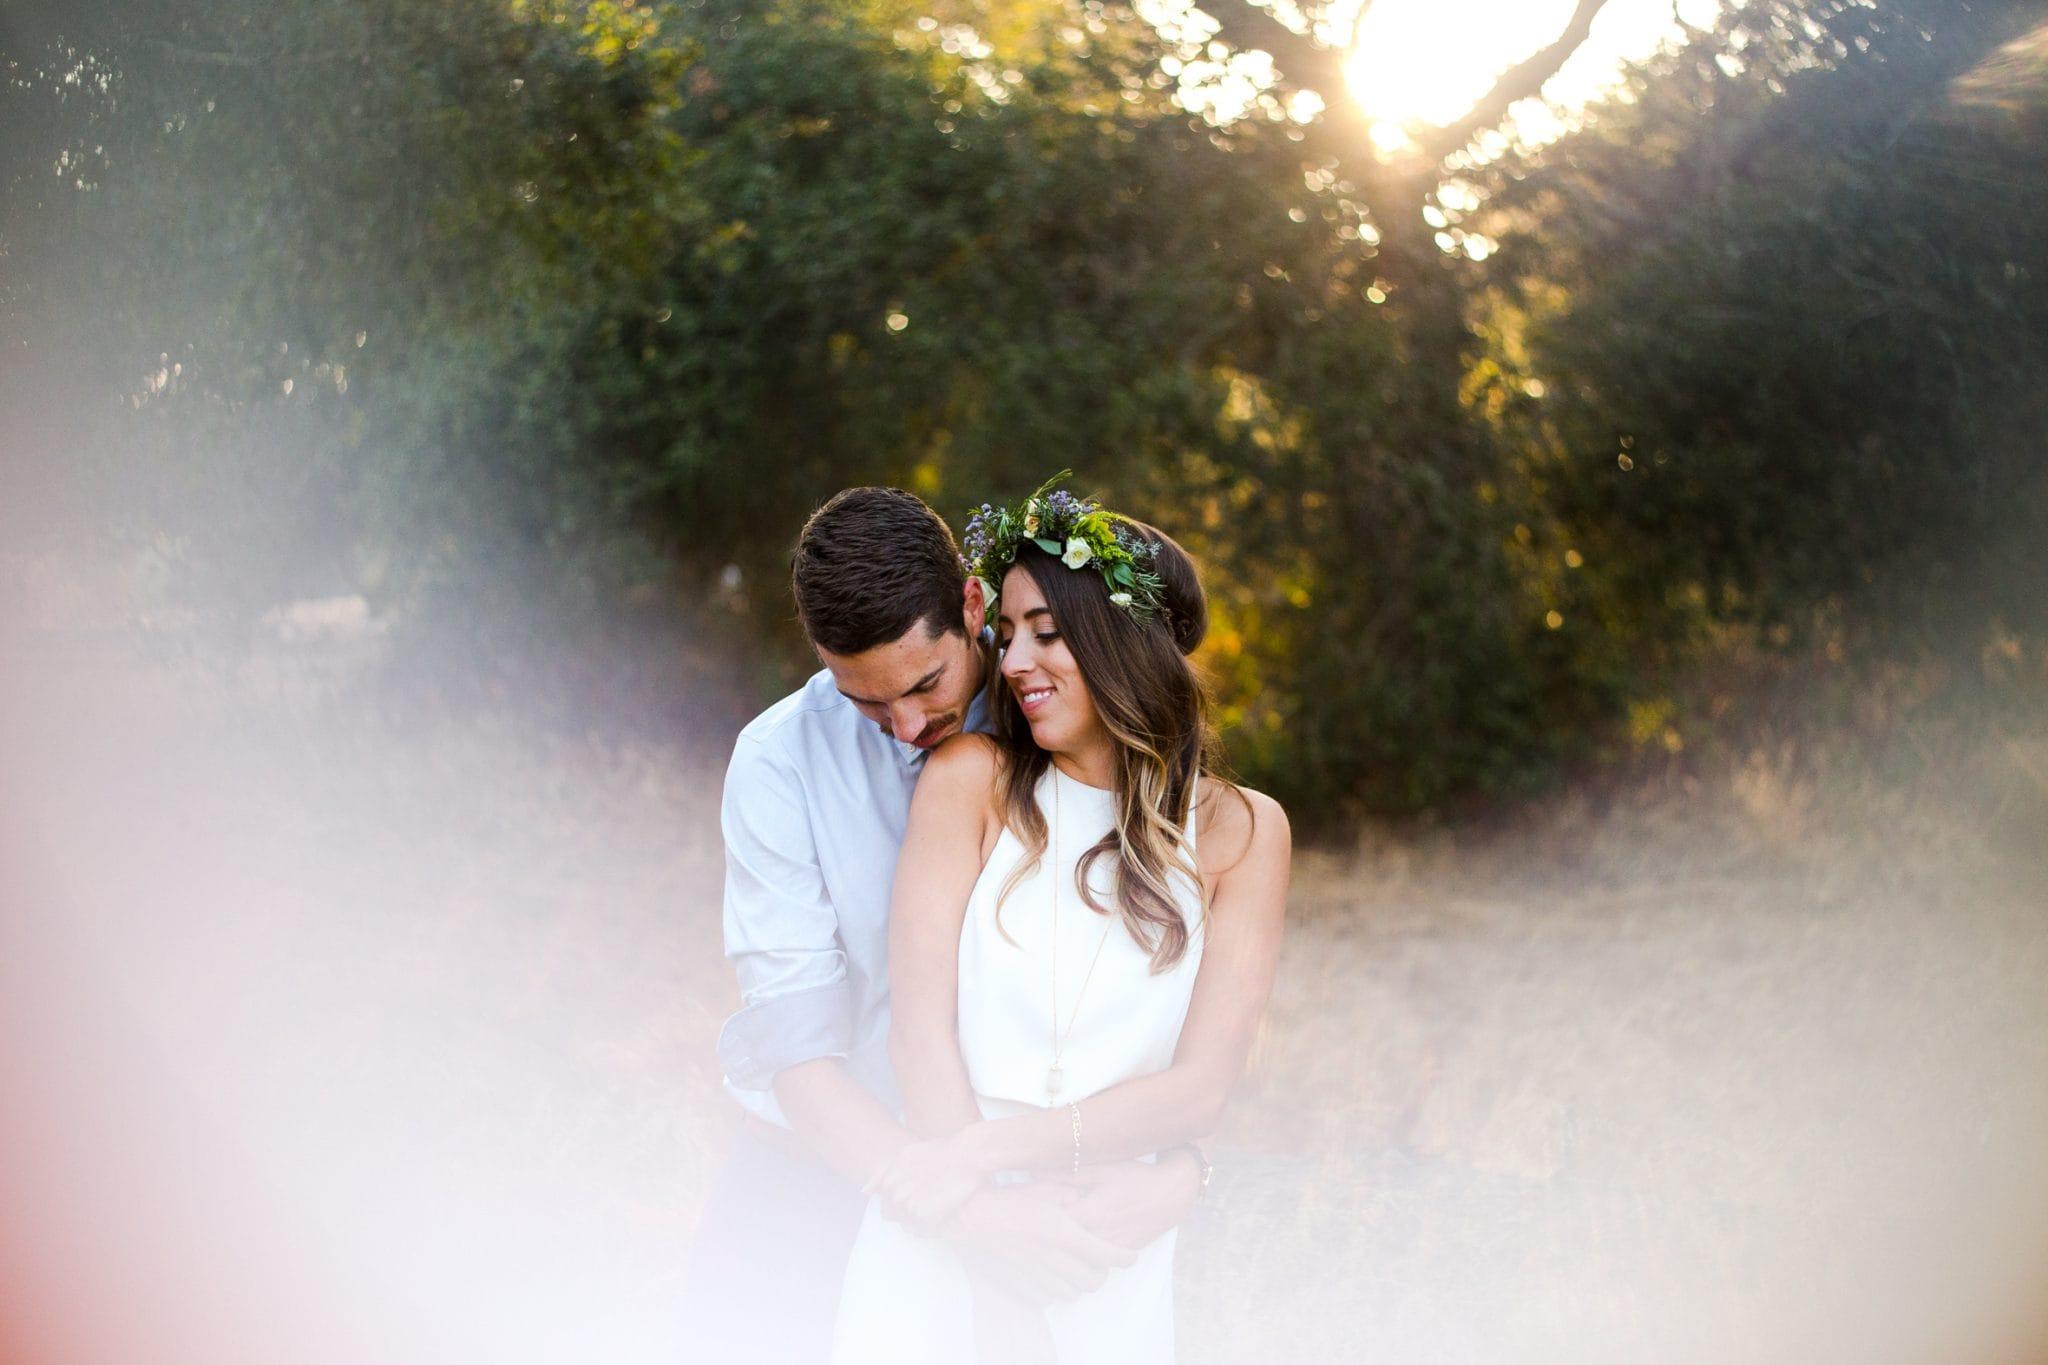 duskin-allison-wedding-717